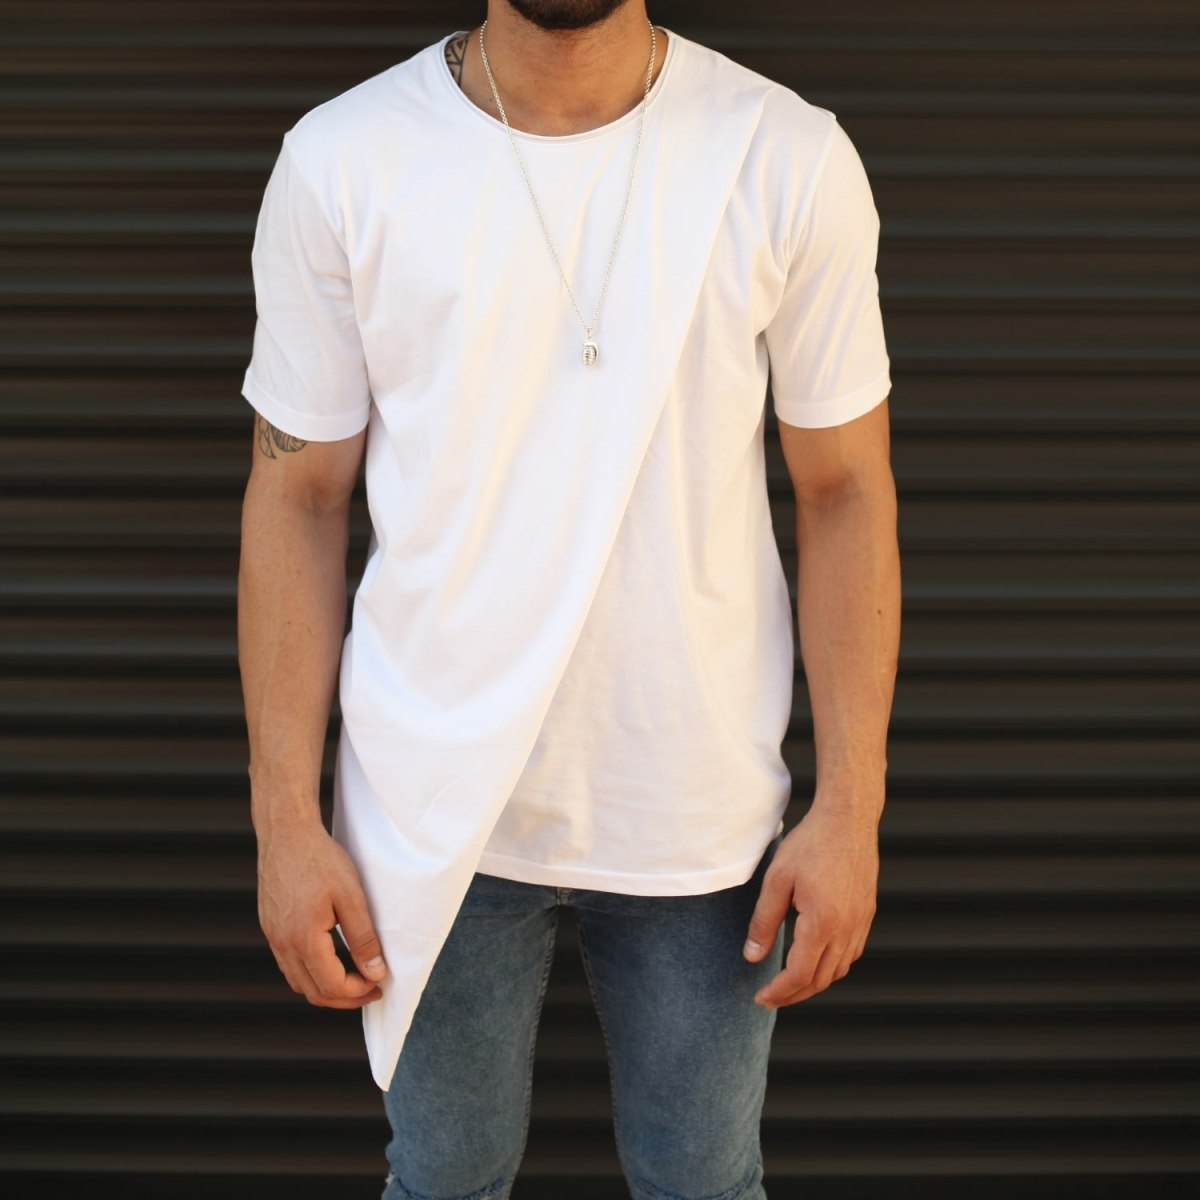 Men's Geometric Cut Longline T-Shirt White Mv Premium Brand - 1